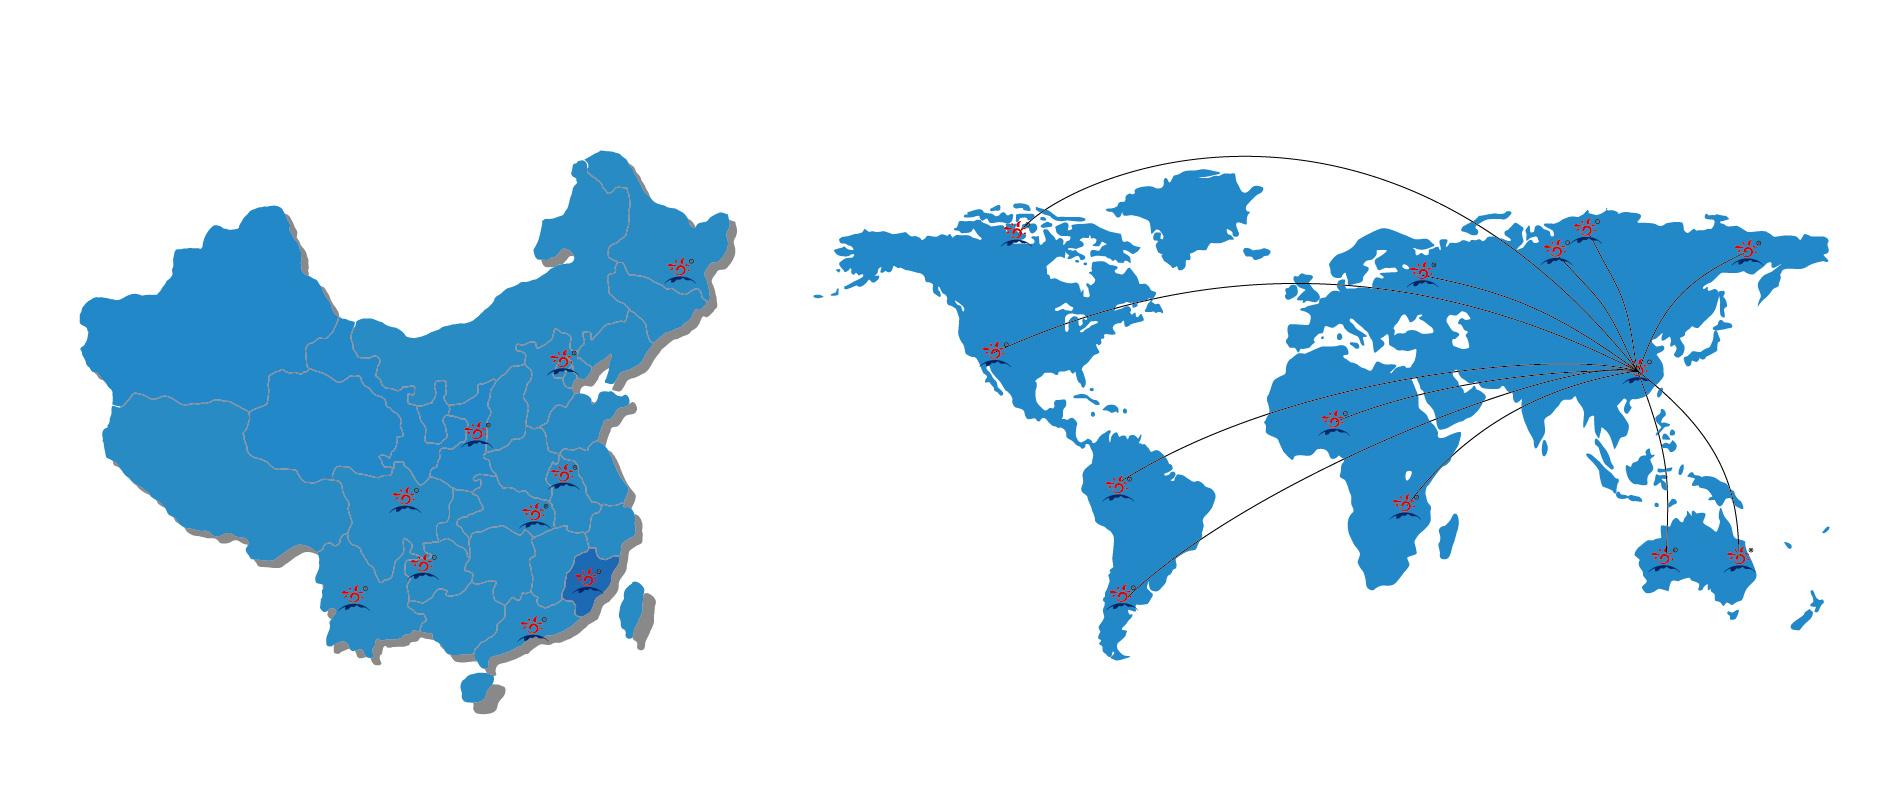 INTECH's Marketing Networks